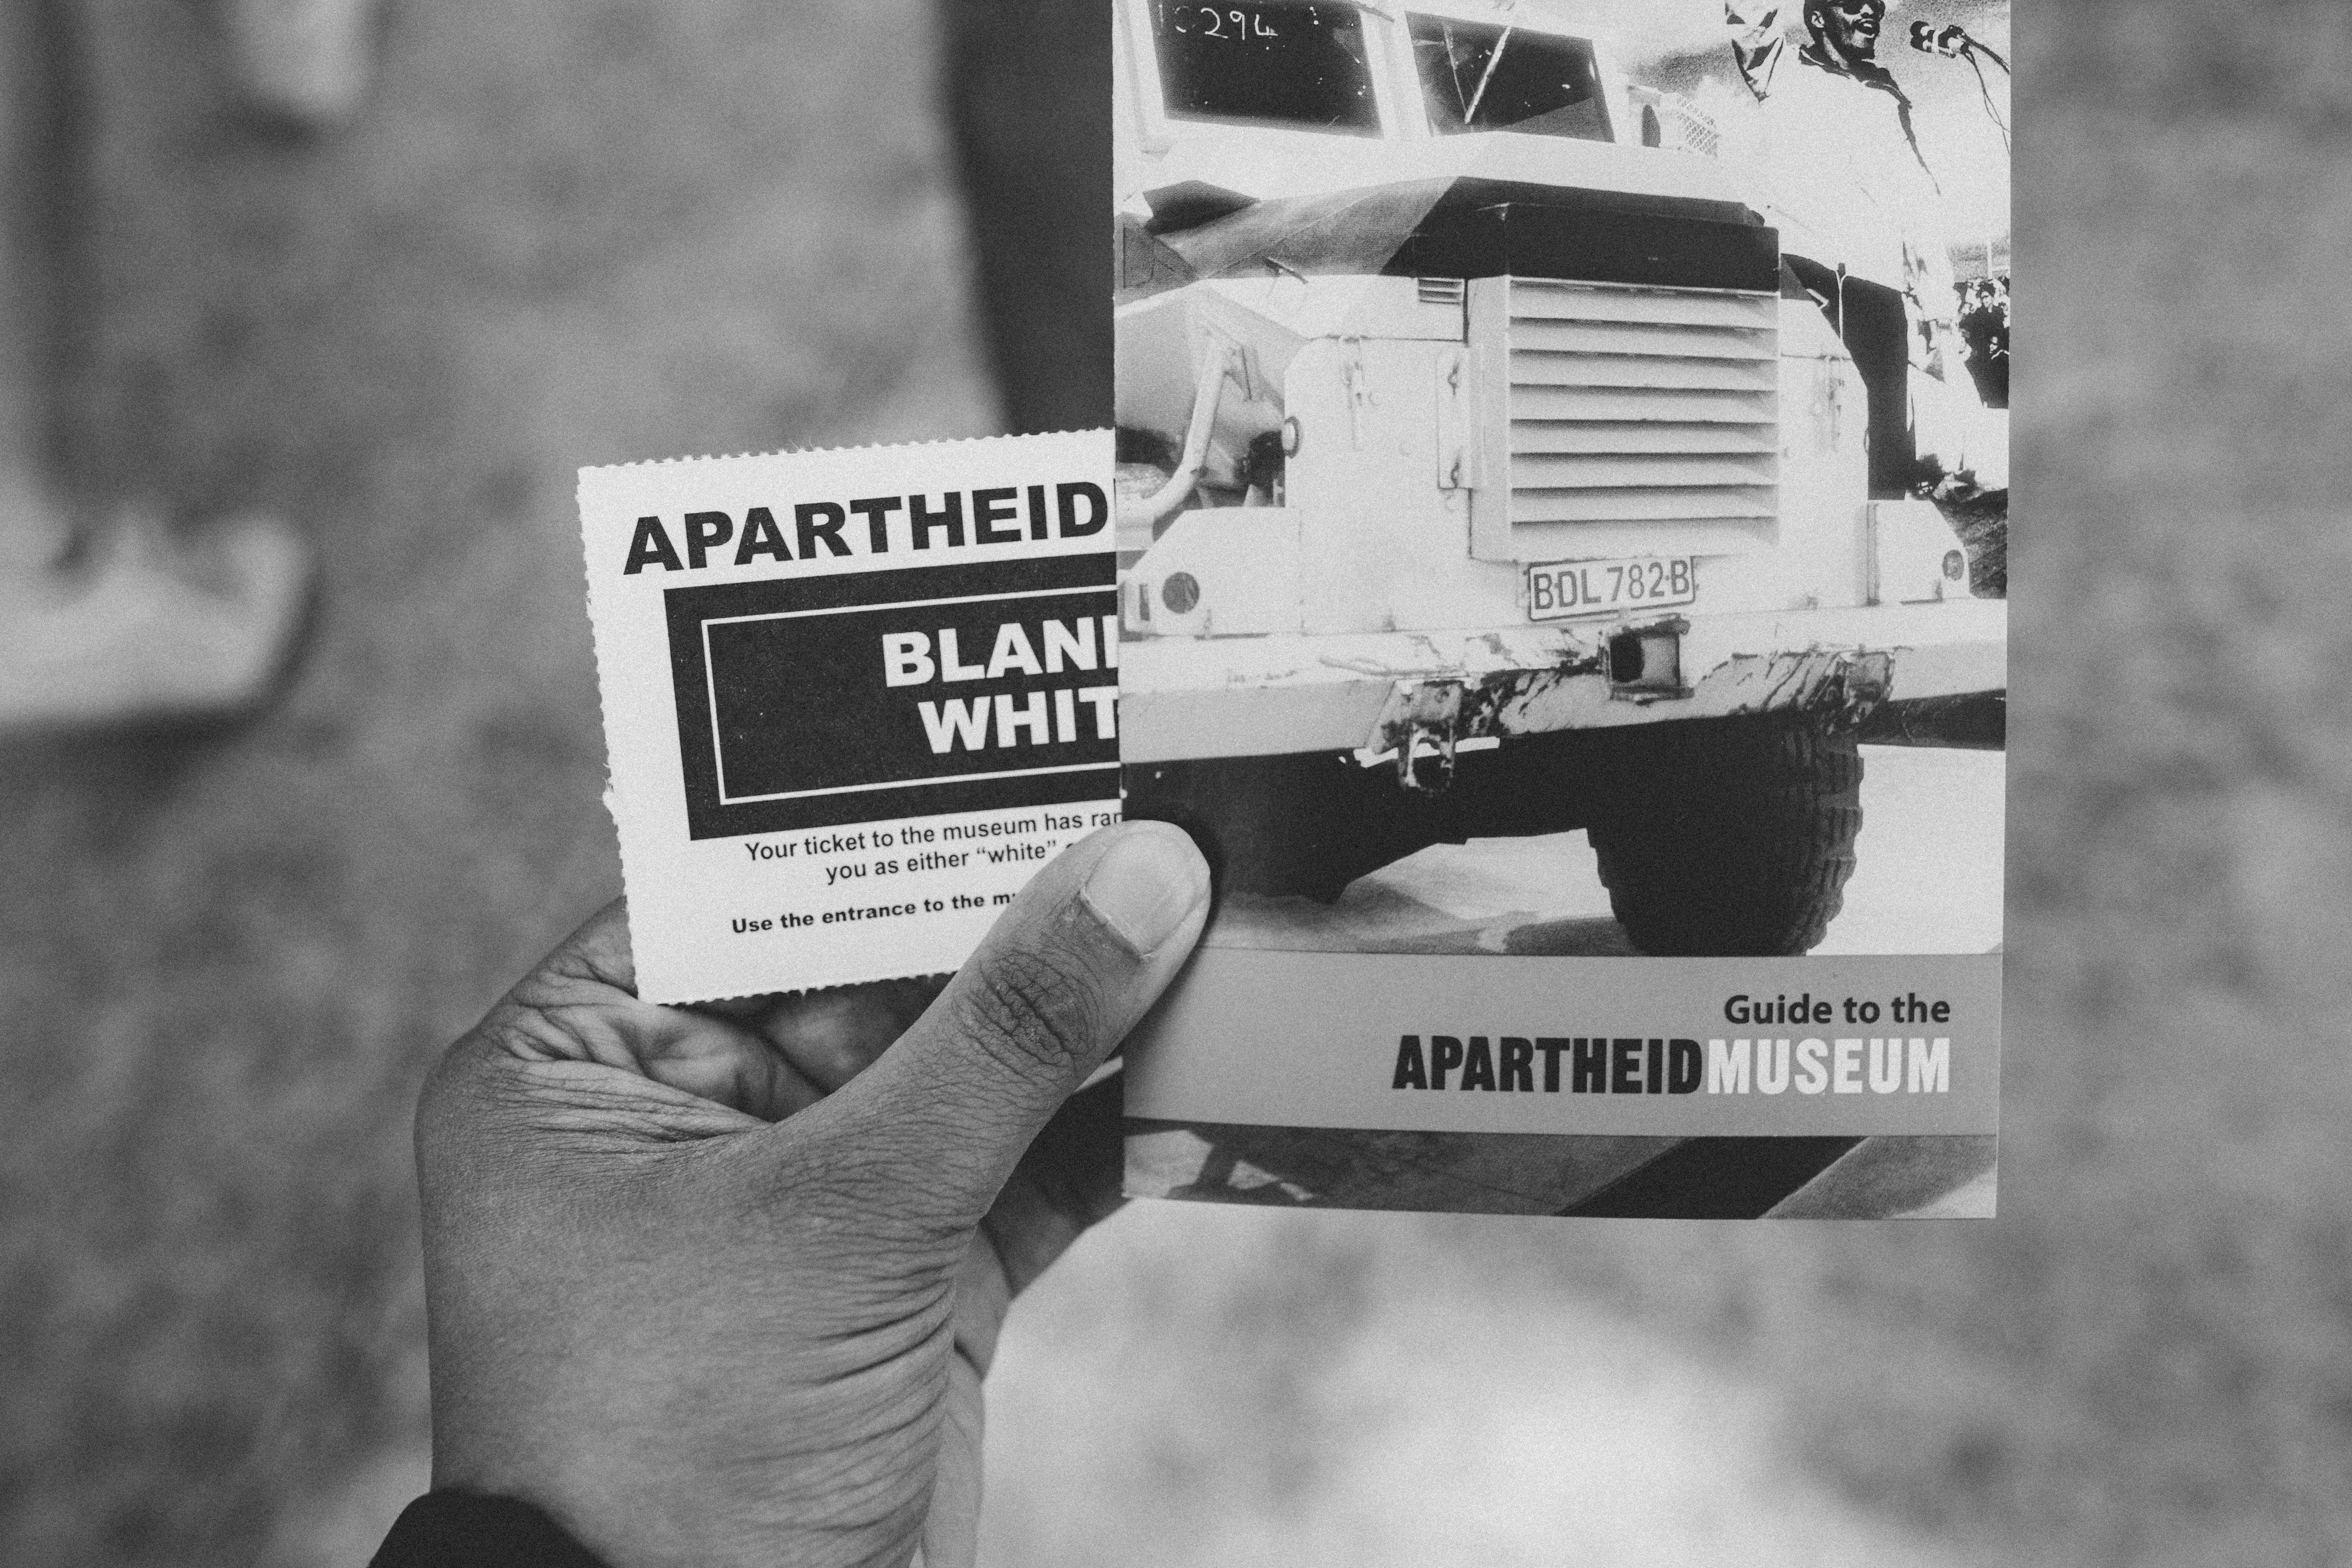 Ticket to Apartheid Museum